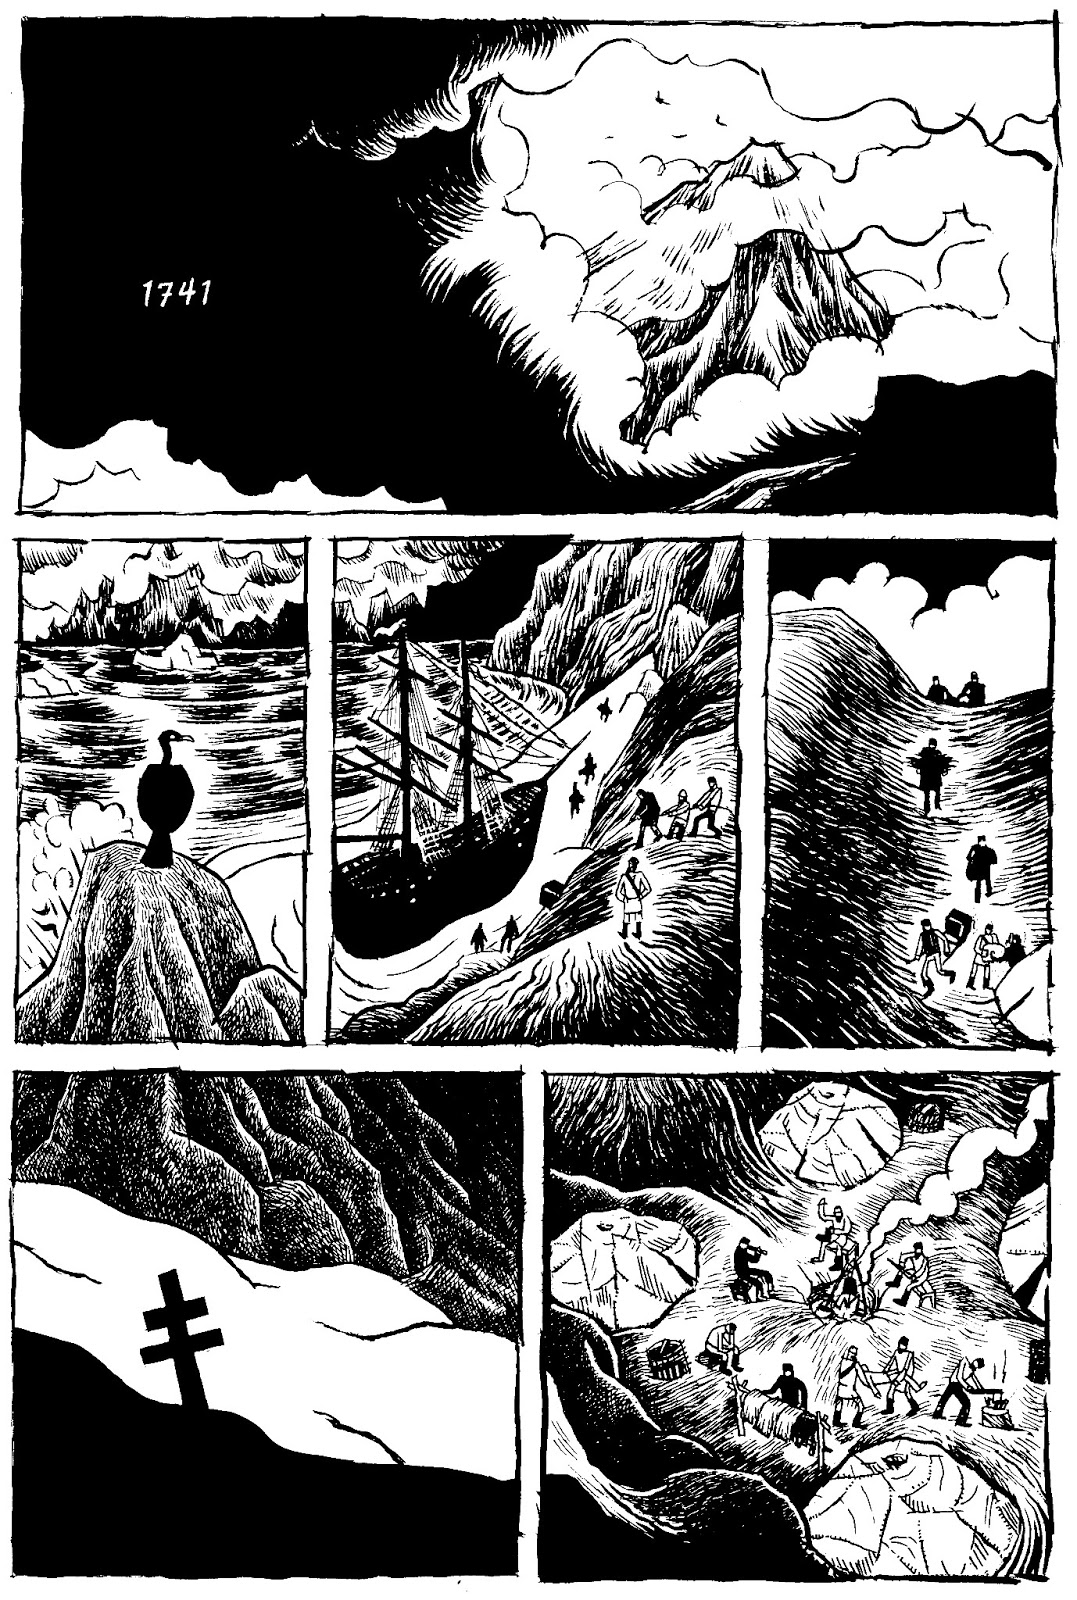 T Edward Bak is creating comics, graphic novels, natural history art